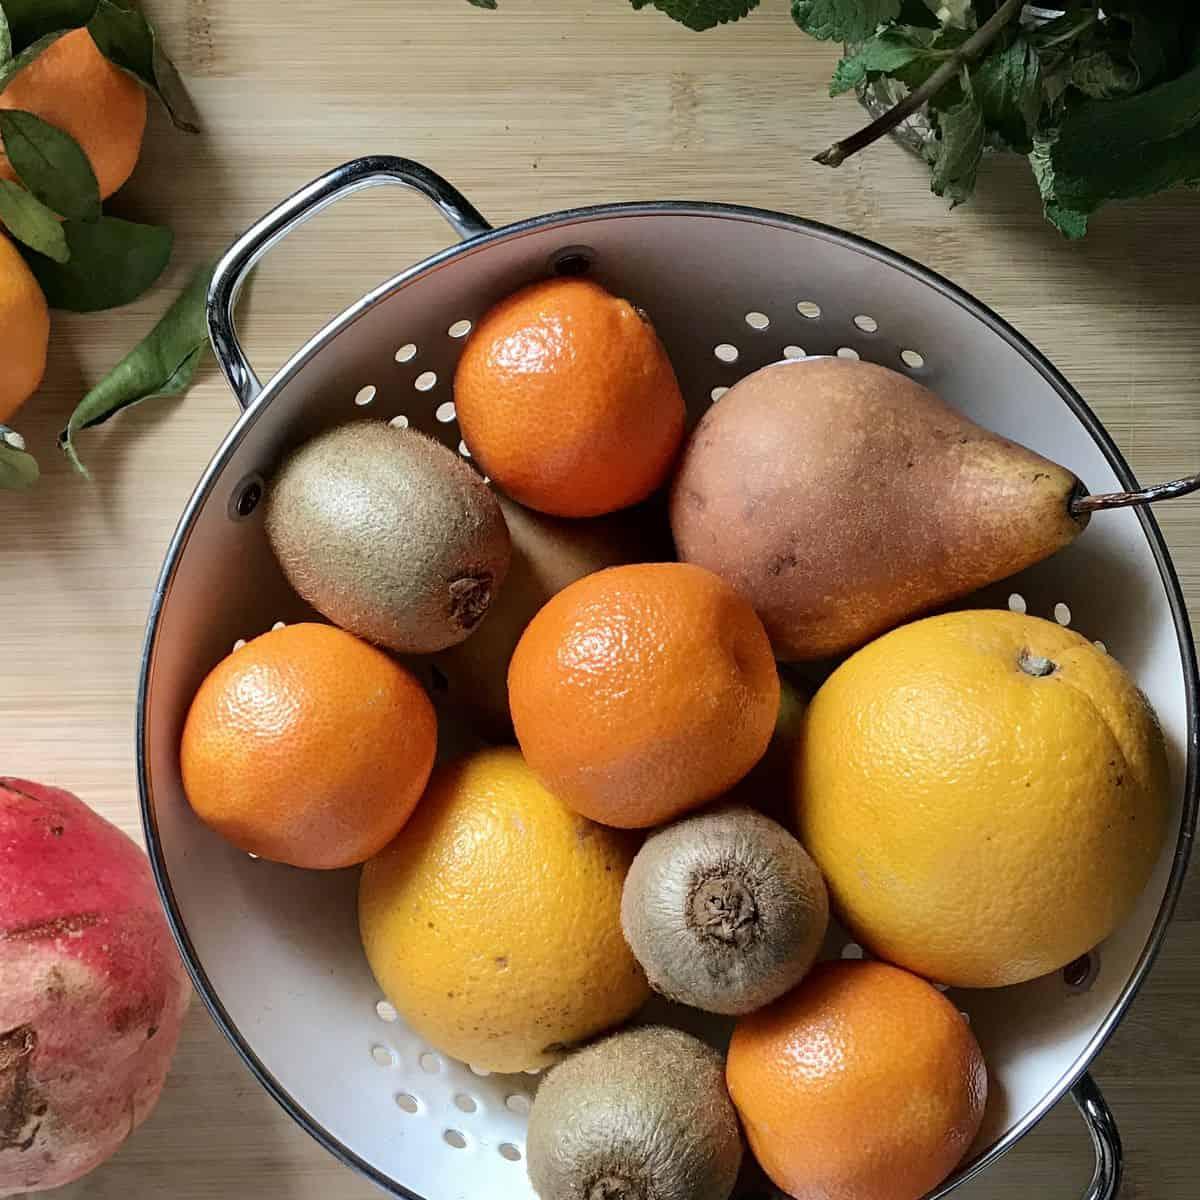 Winter fruits in a colander.